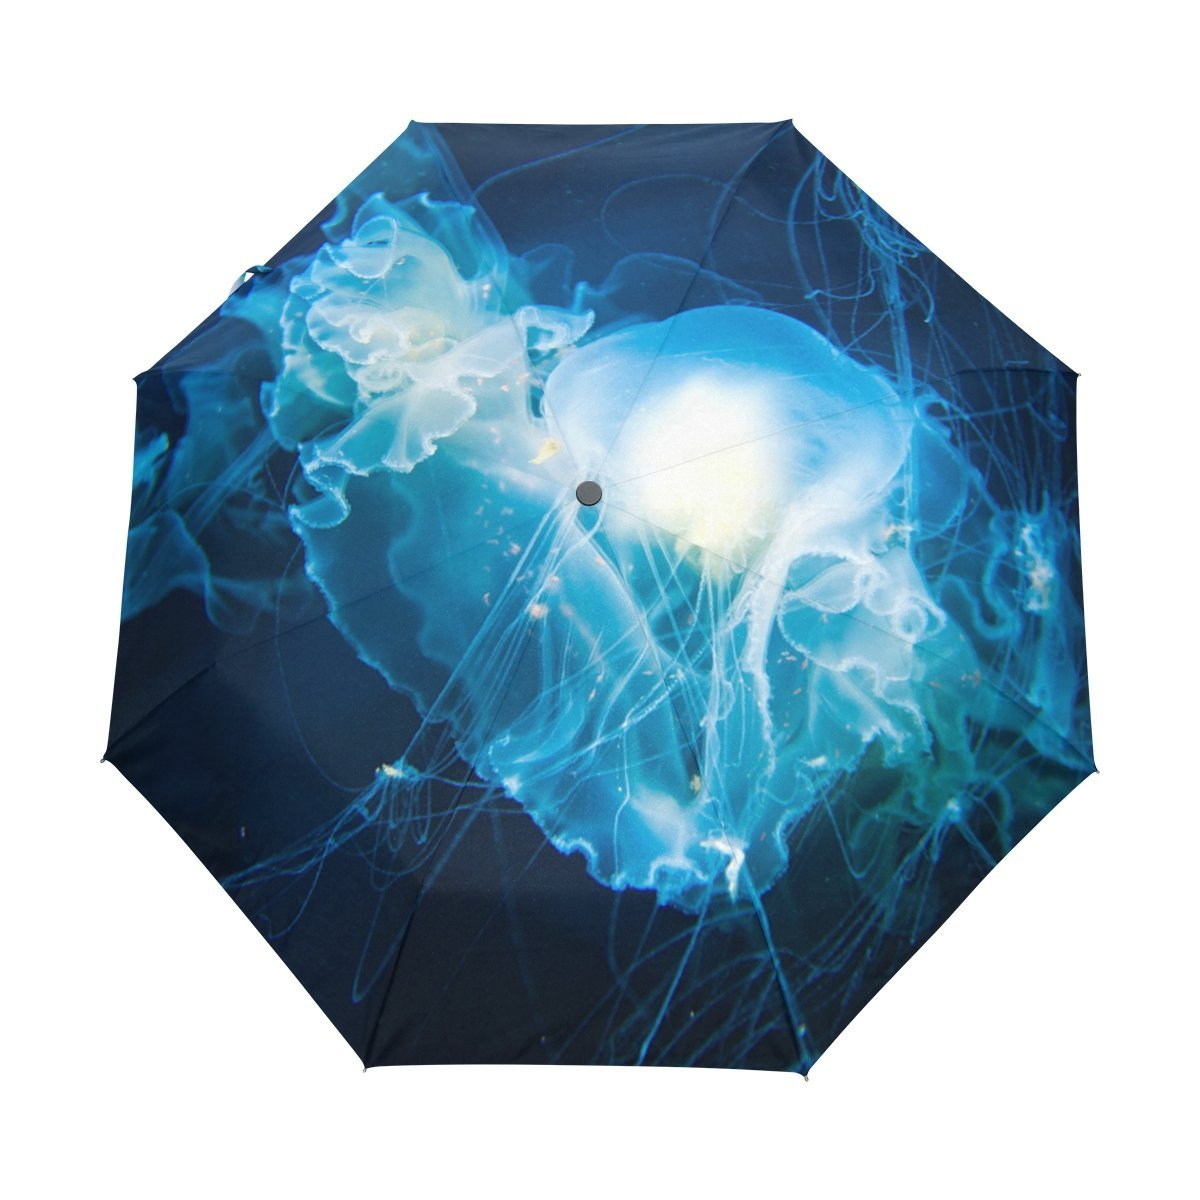 cd878ceeff81 Cheap Blue Foldable Transparent Umbrella, find Blue Foldable ...